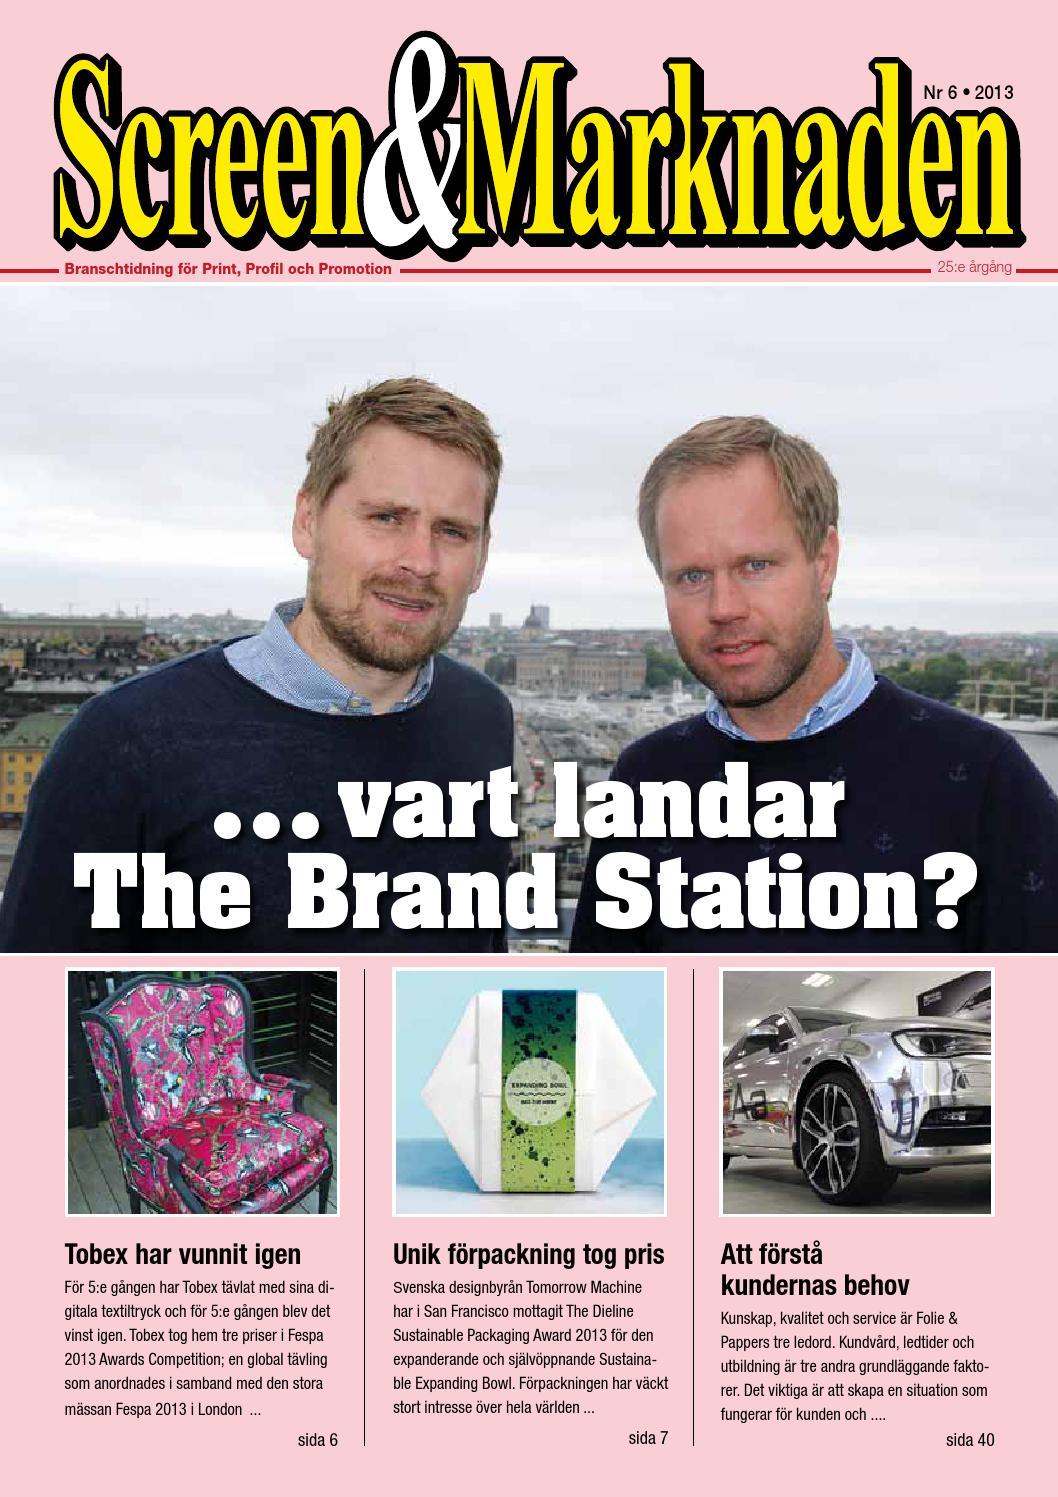 Screenmarknaden 6 2013 by Martin Eriksson - issuu a7528928e0c9f